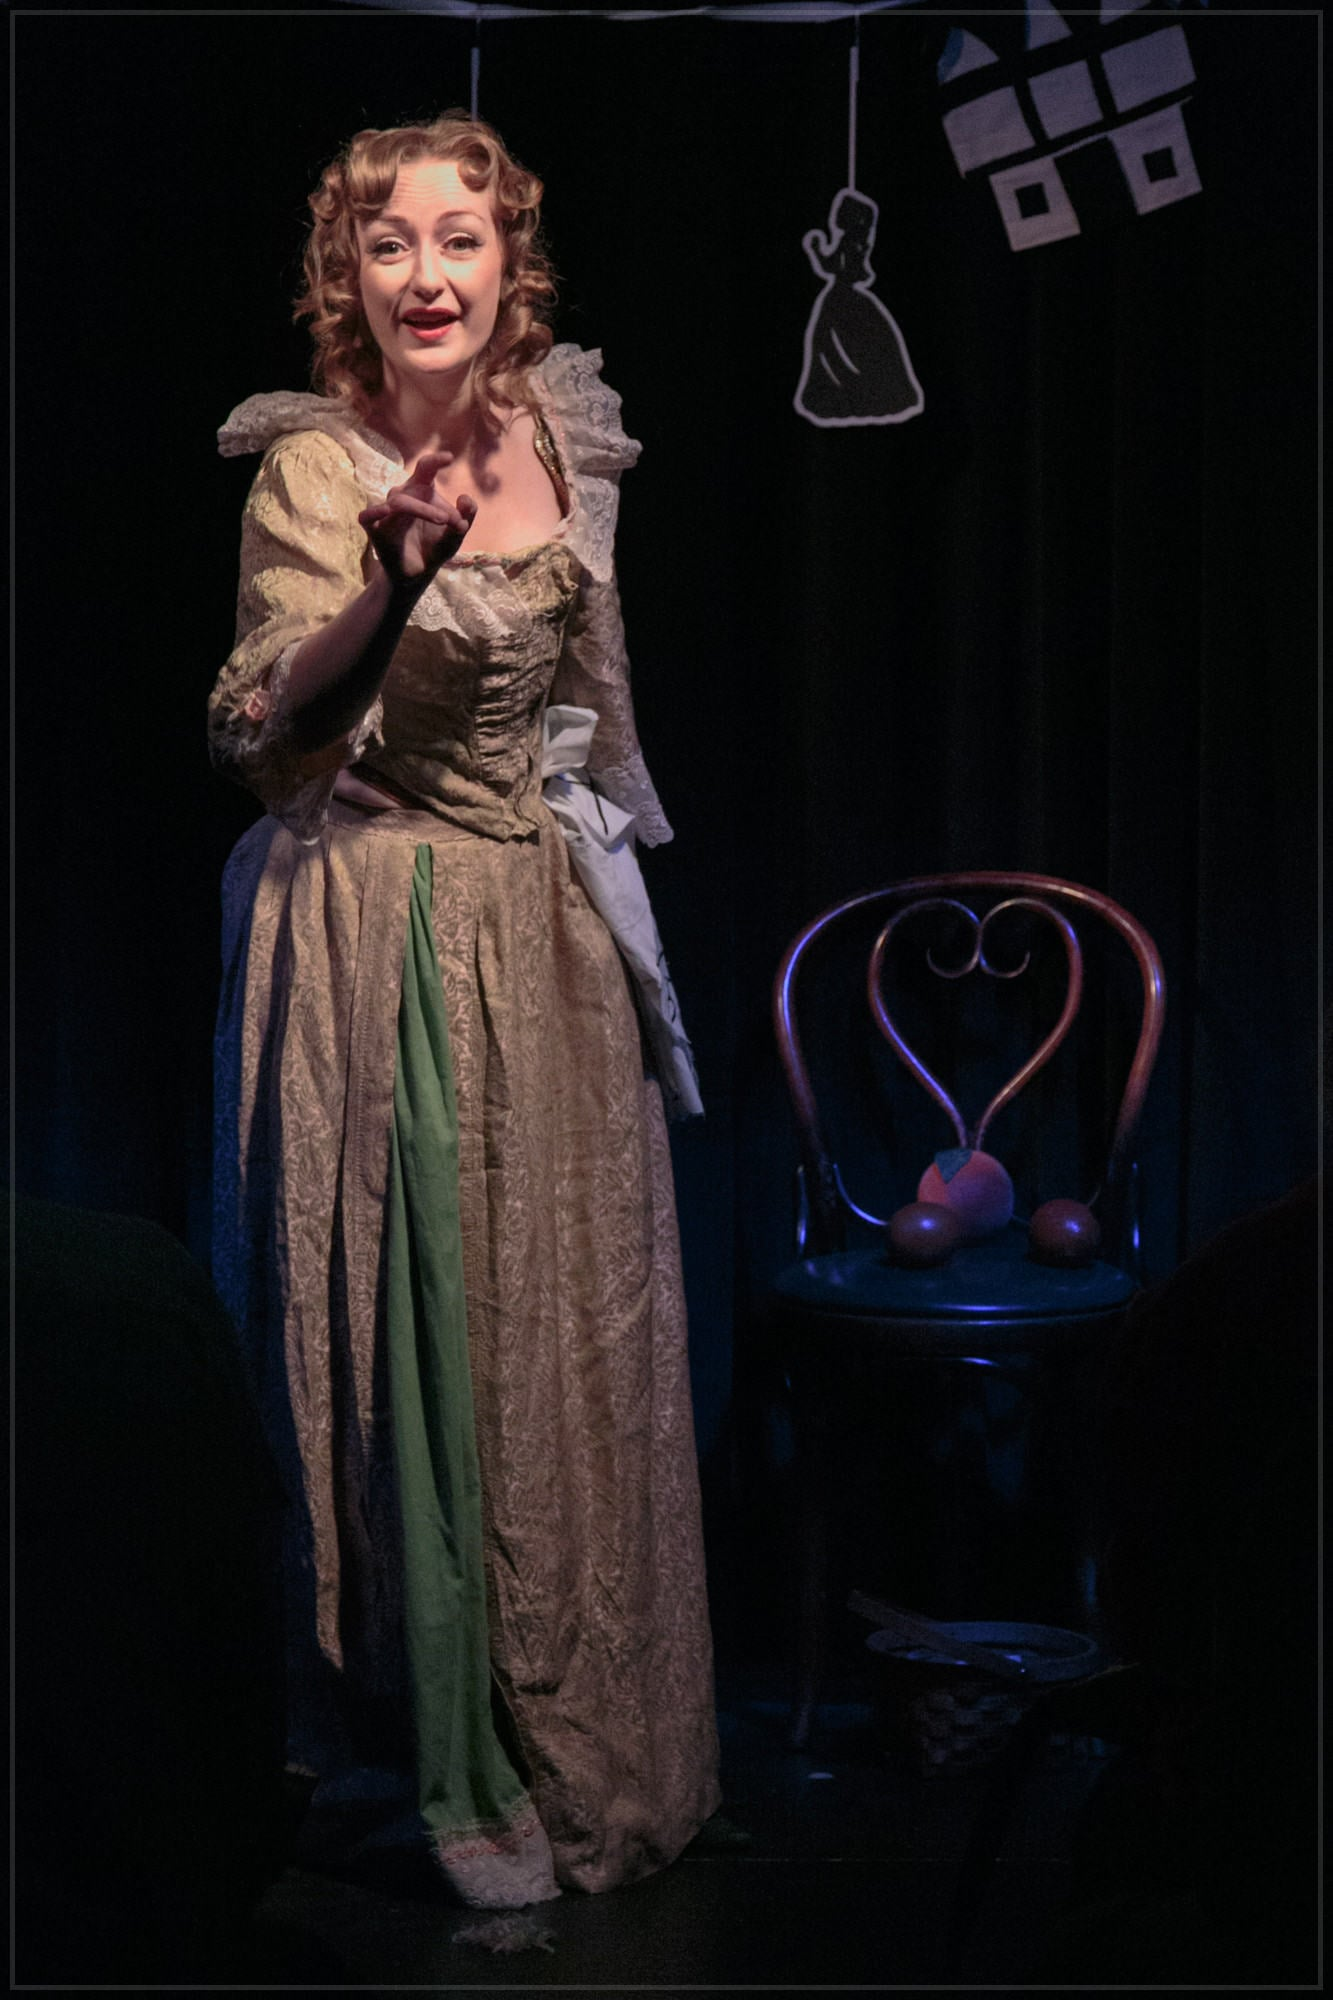 Ginger Blush - Nell Gwynn's History Laid Bare 067.jpg